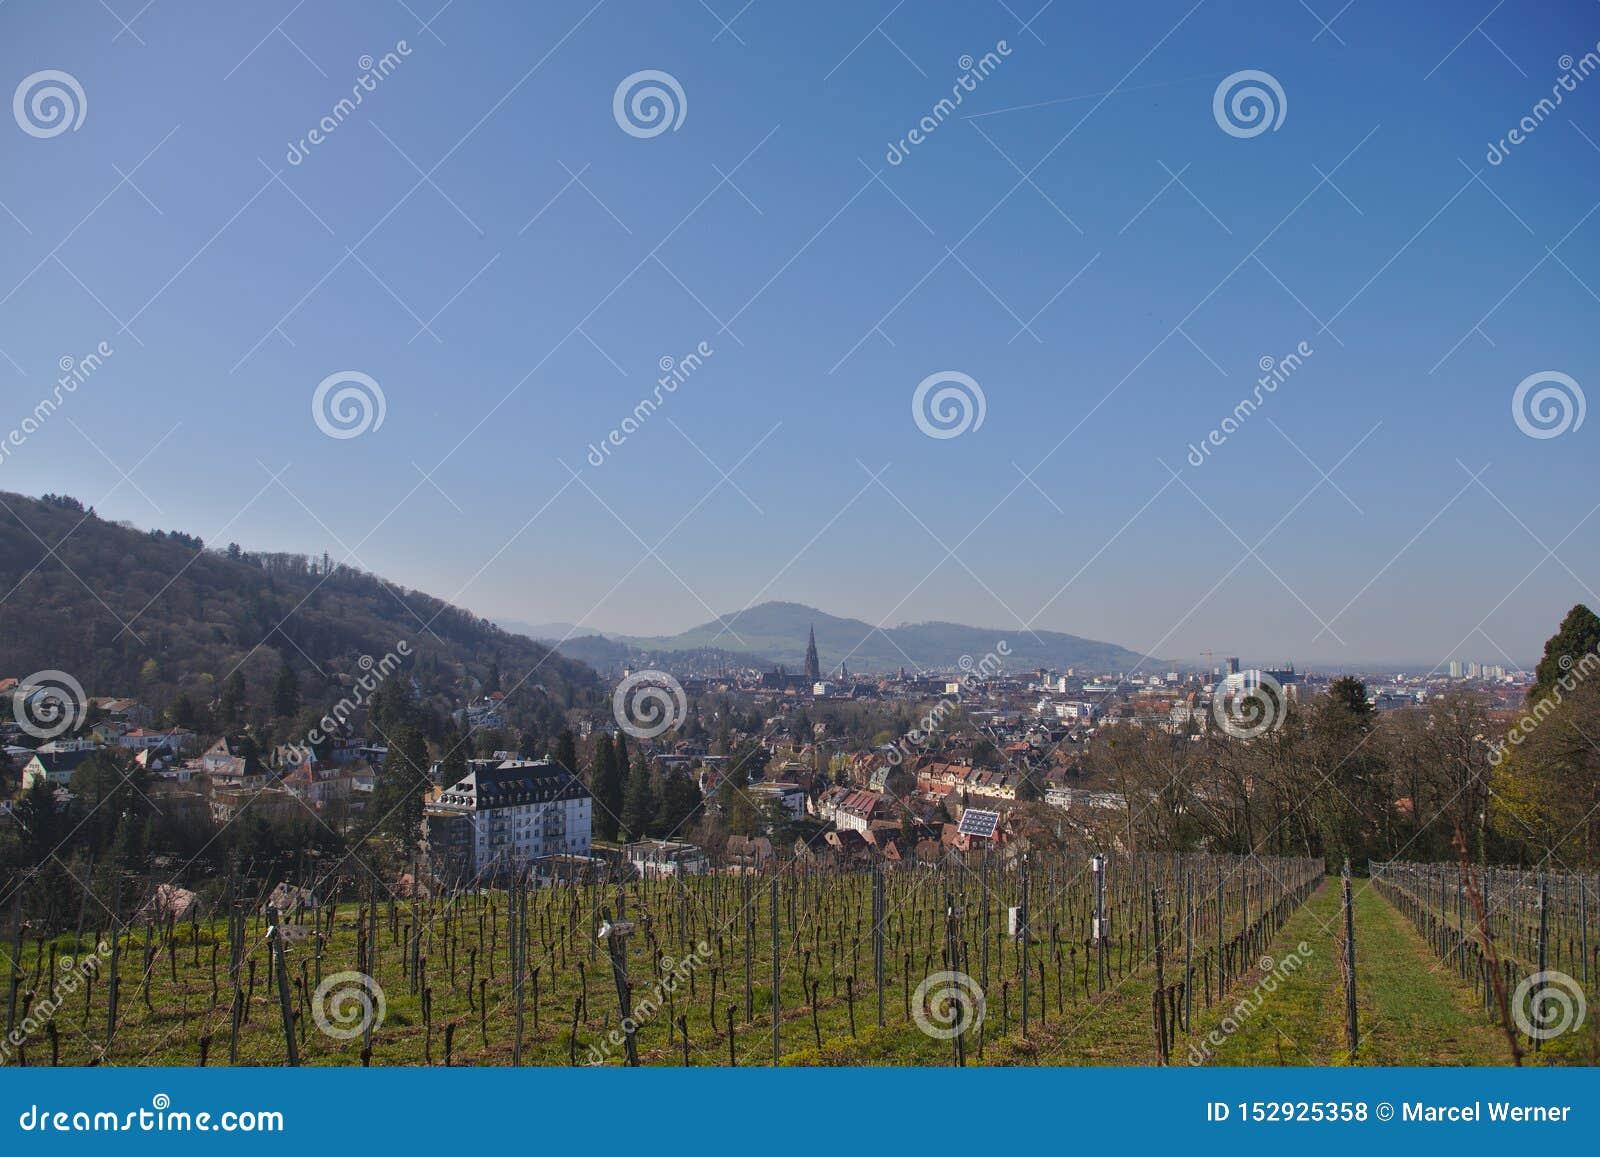 Vista de Freiburg-im-Breisgau de un viñedo